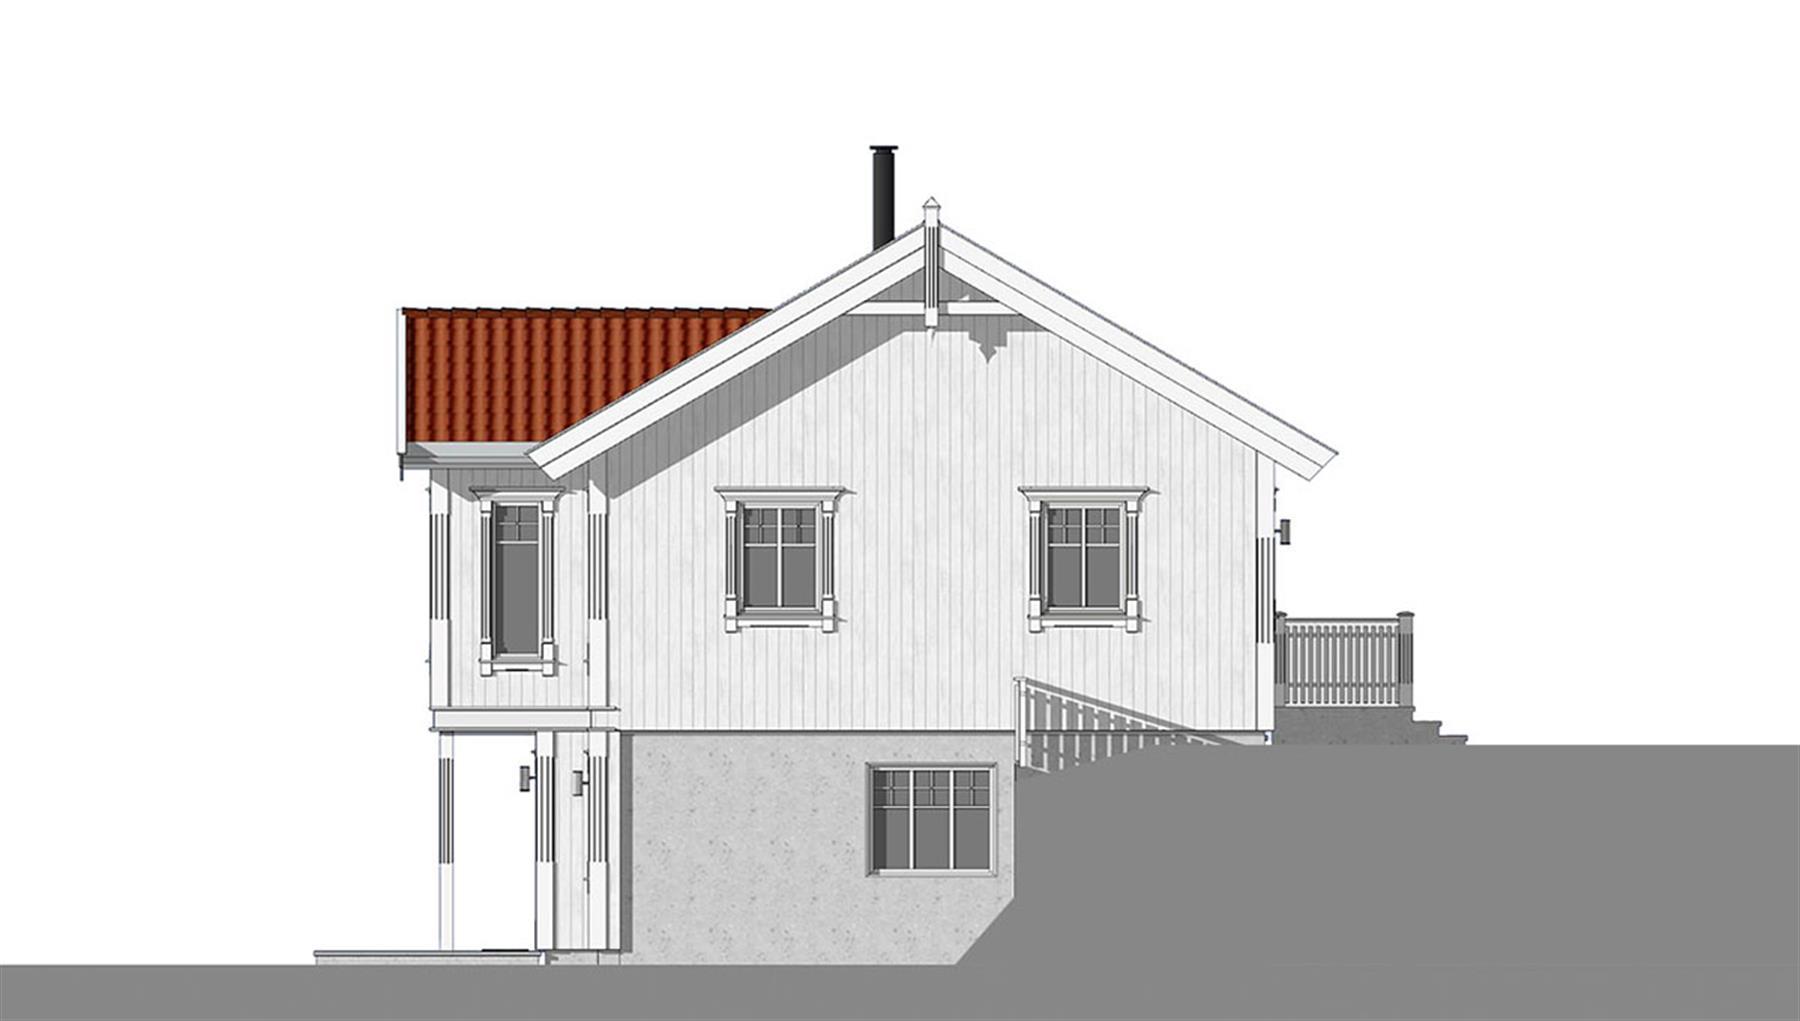 Korsfjord fasade 2